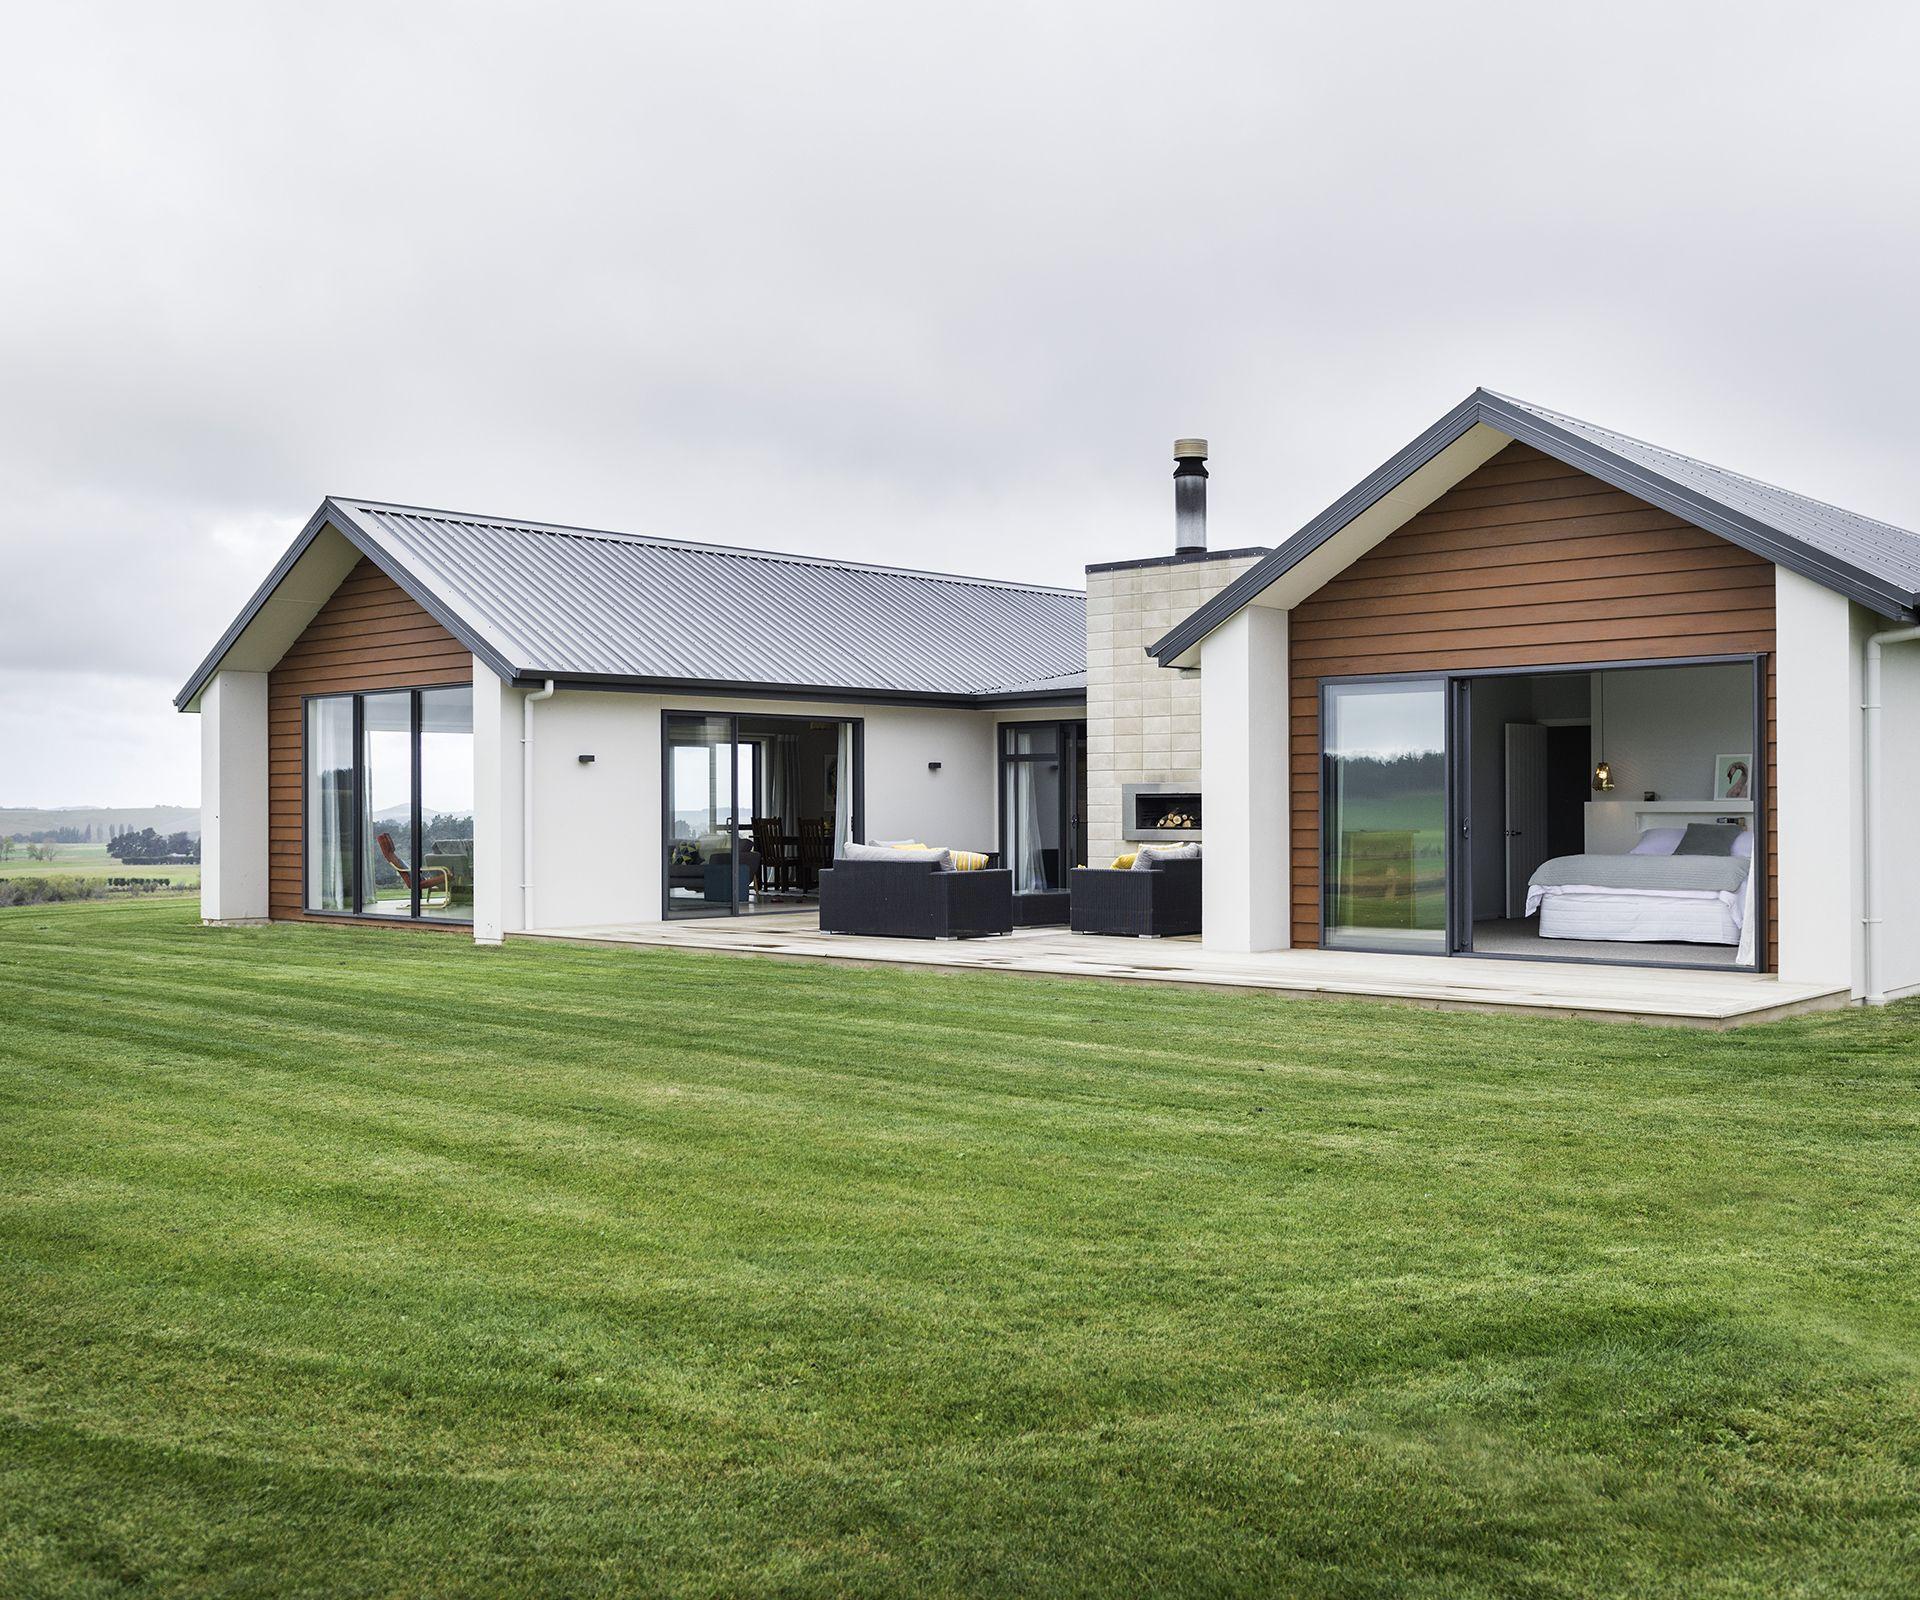 Small Modern Home Exteriors: Cattle Farmers Build Their Dream Home In Rural North Otago